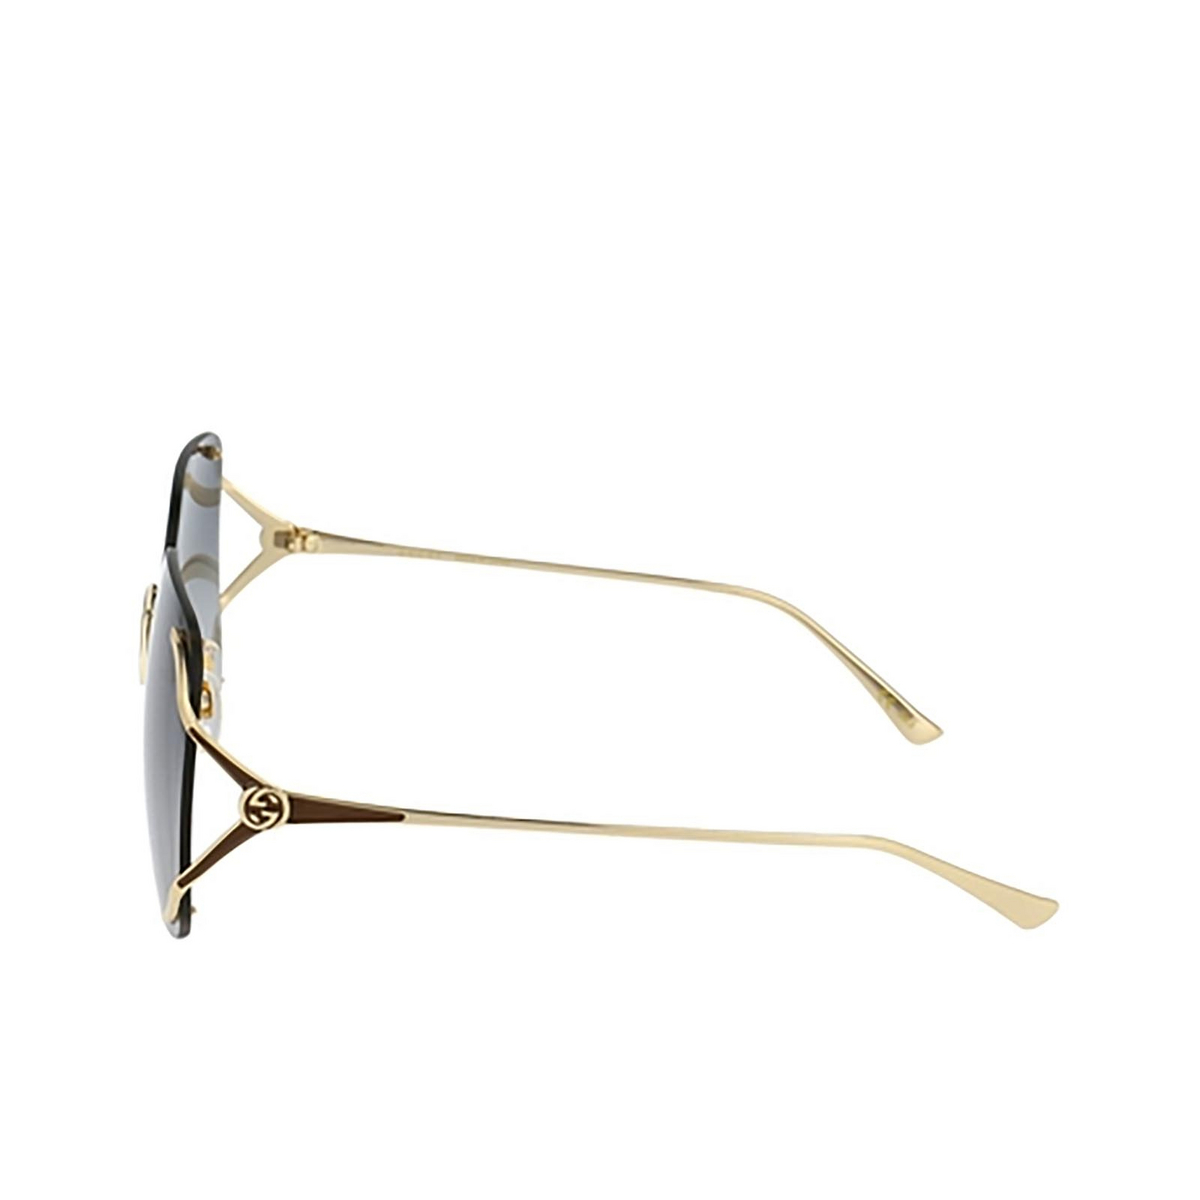 Gucci® Rectangle Sunglasses: GG0646S color Gold 001 - 3/3.